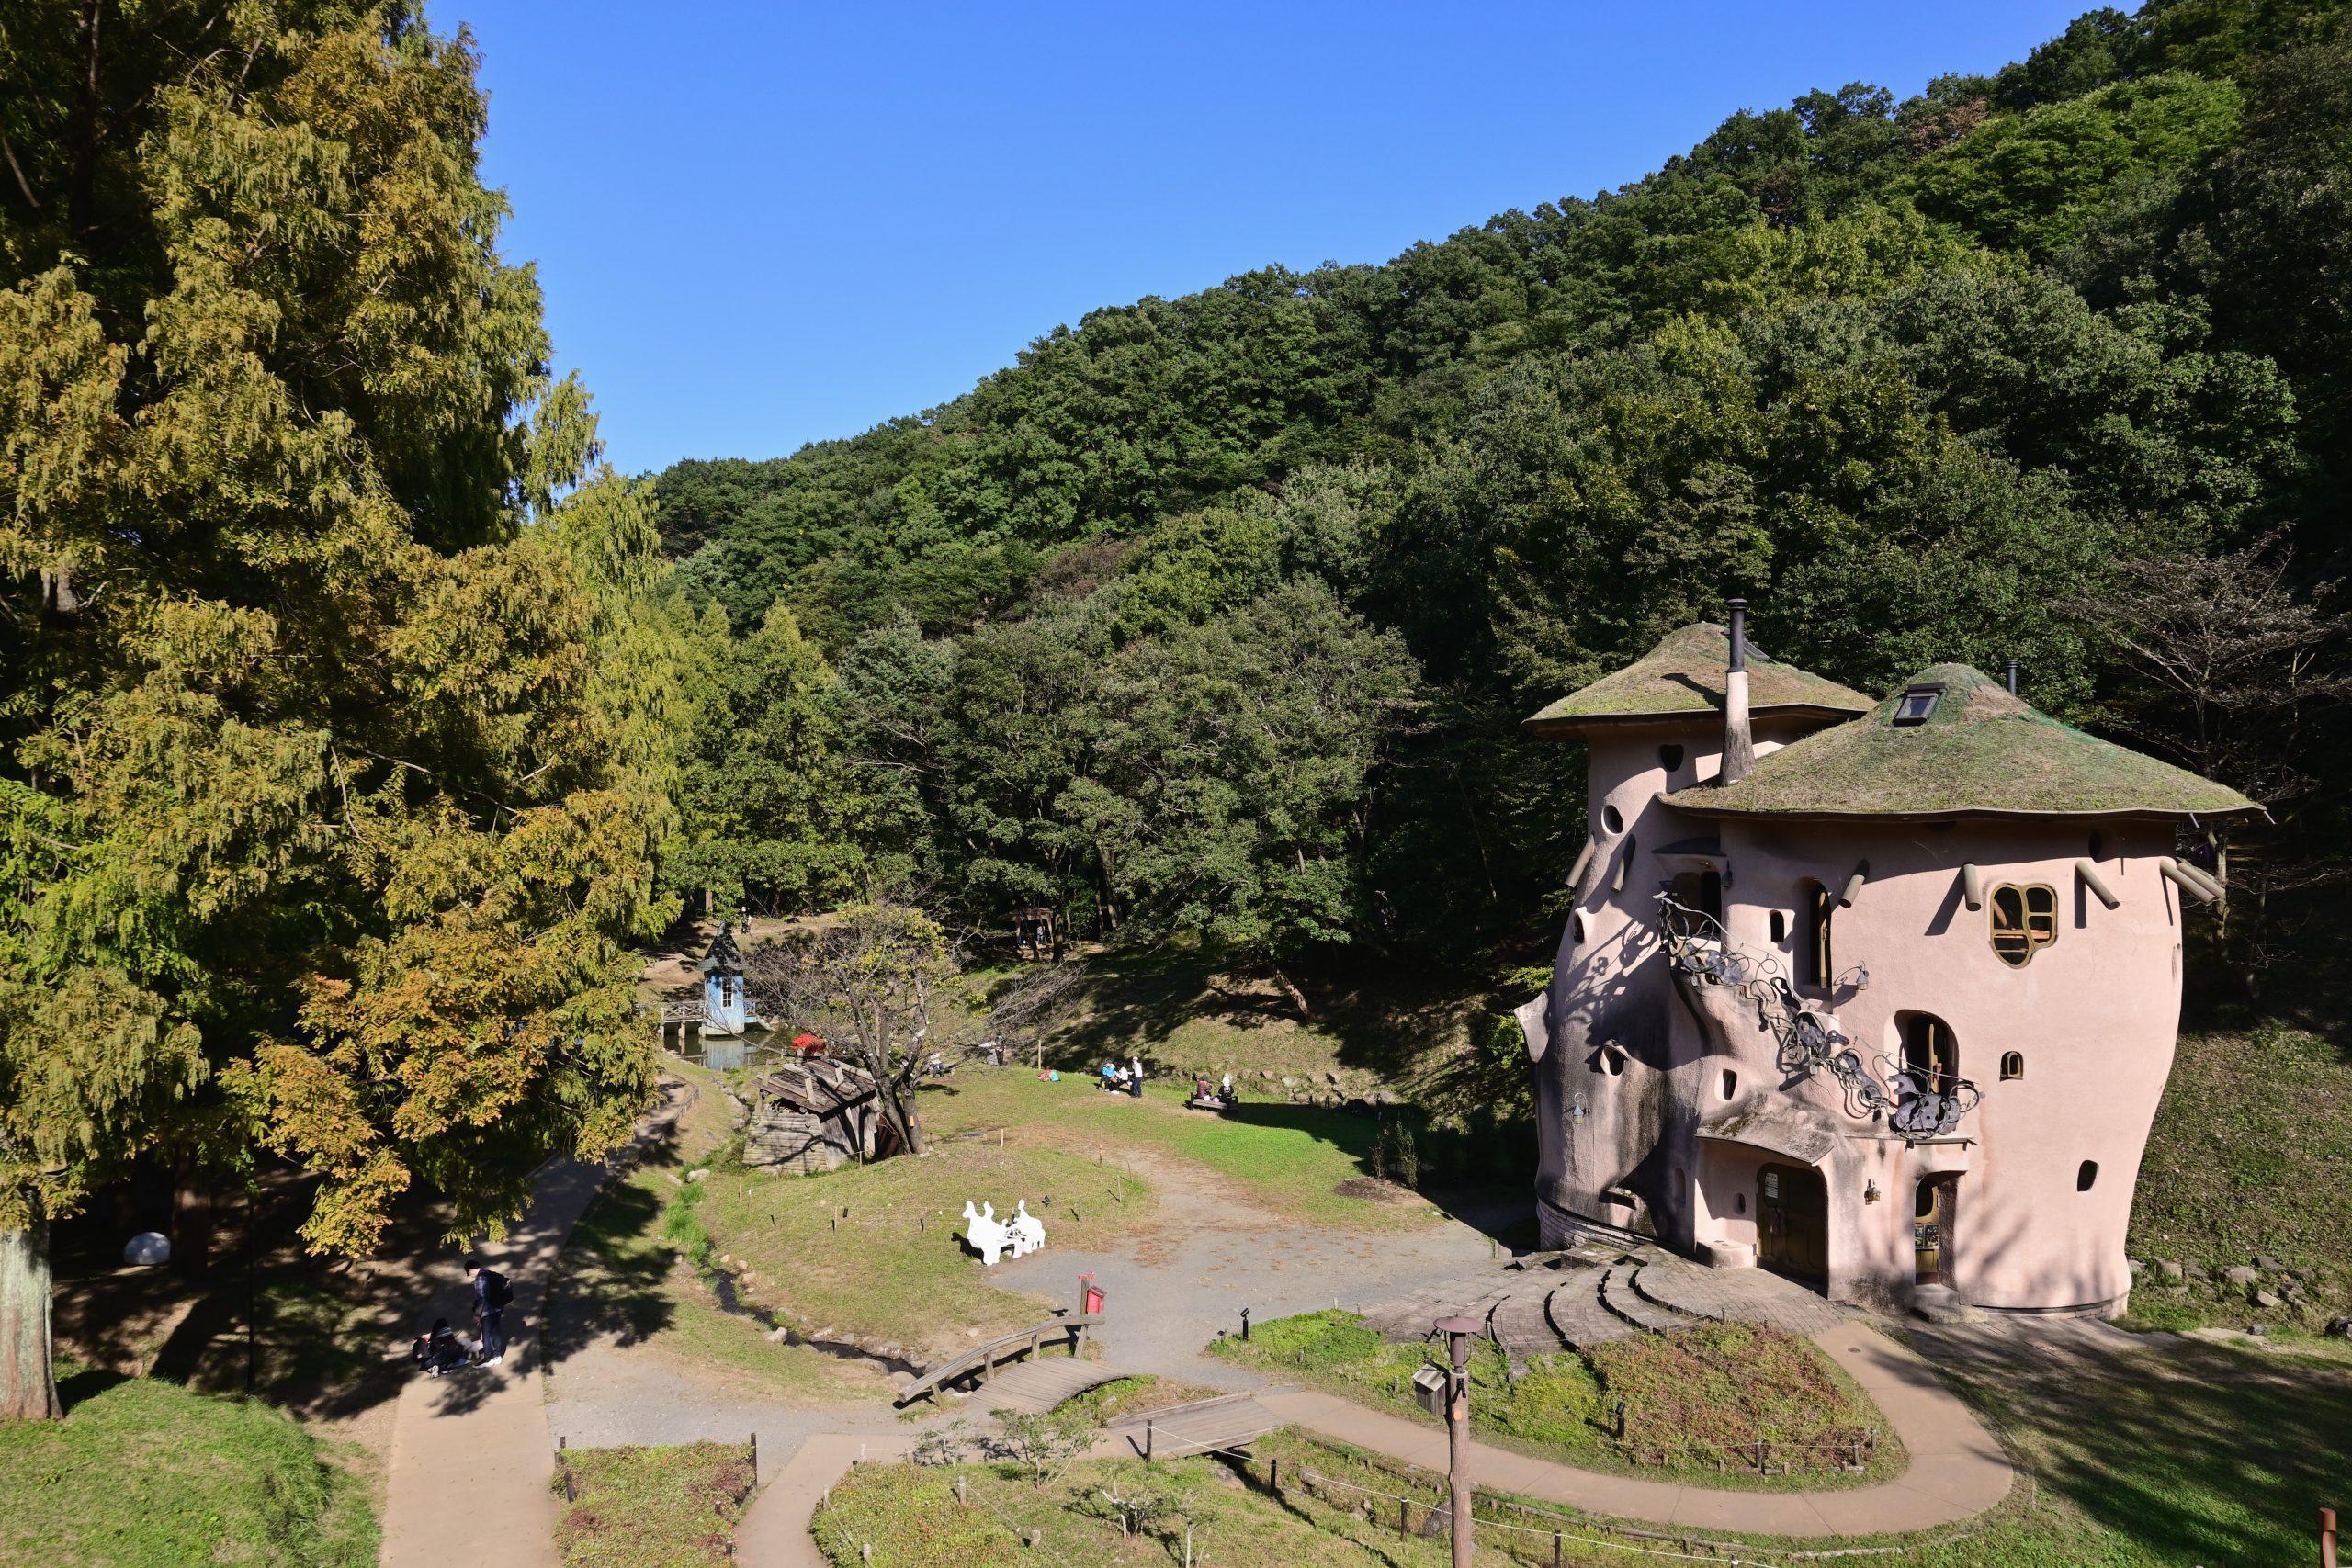 【Go To フォト】Nikon Z50でムーミン谷と狭山湖を撮る